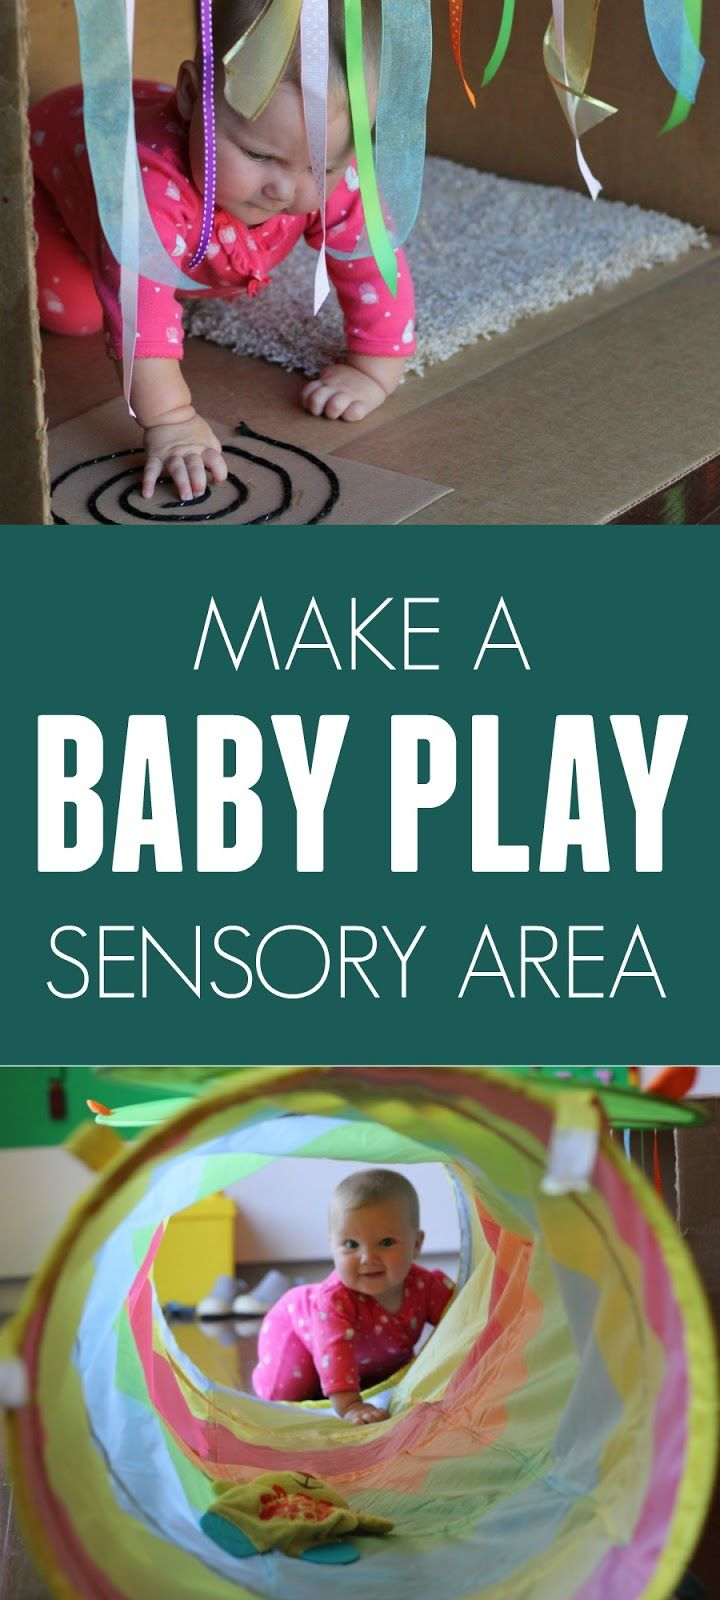 Easy Baby Sensory Play Area Ideas Toddler Approved Baby Play Areas Infant Activities Baby Sensory